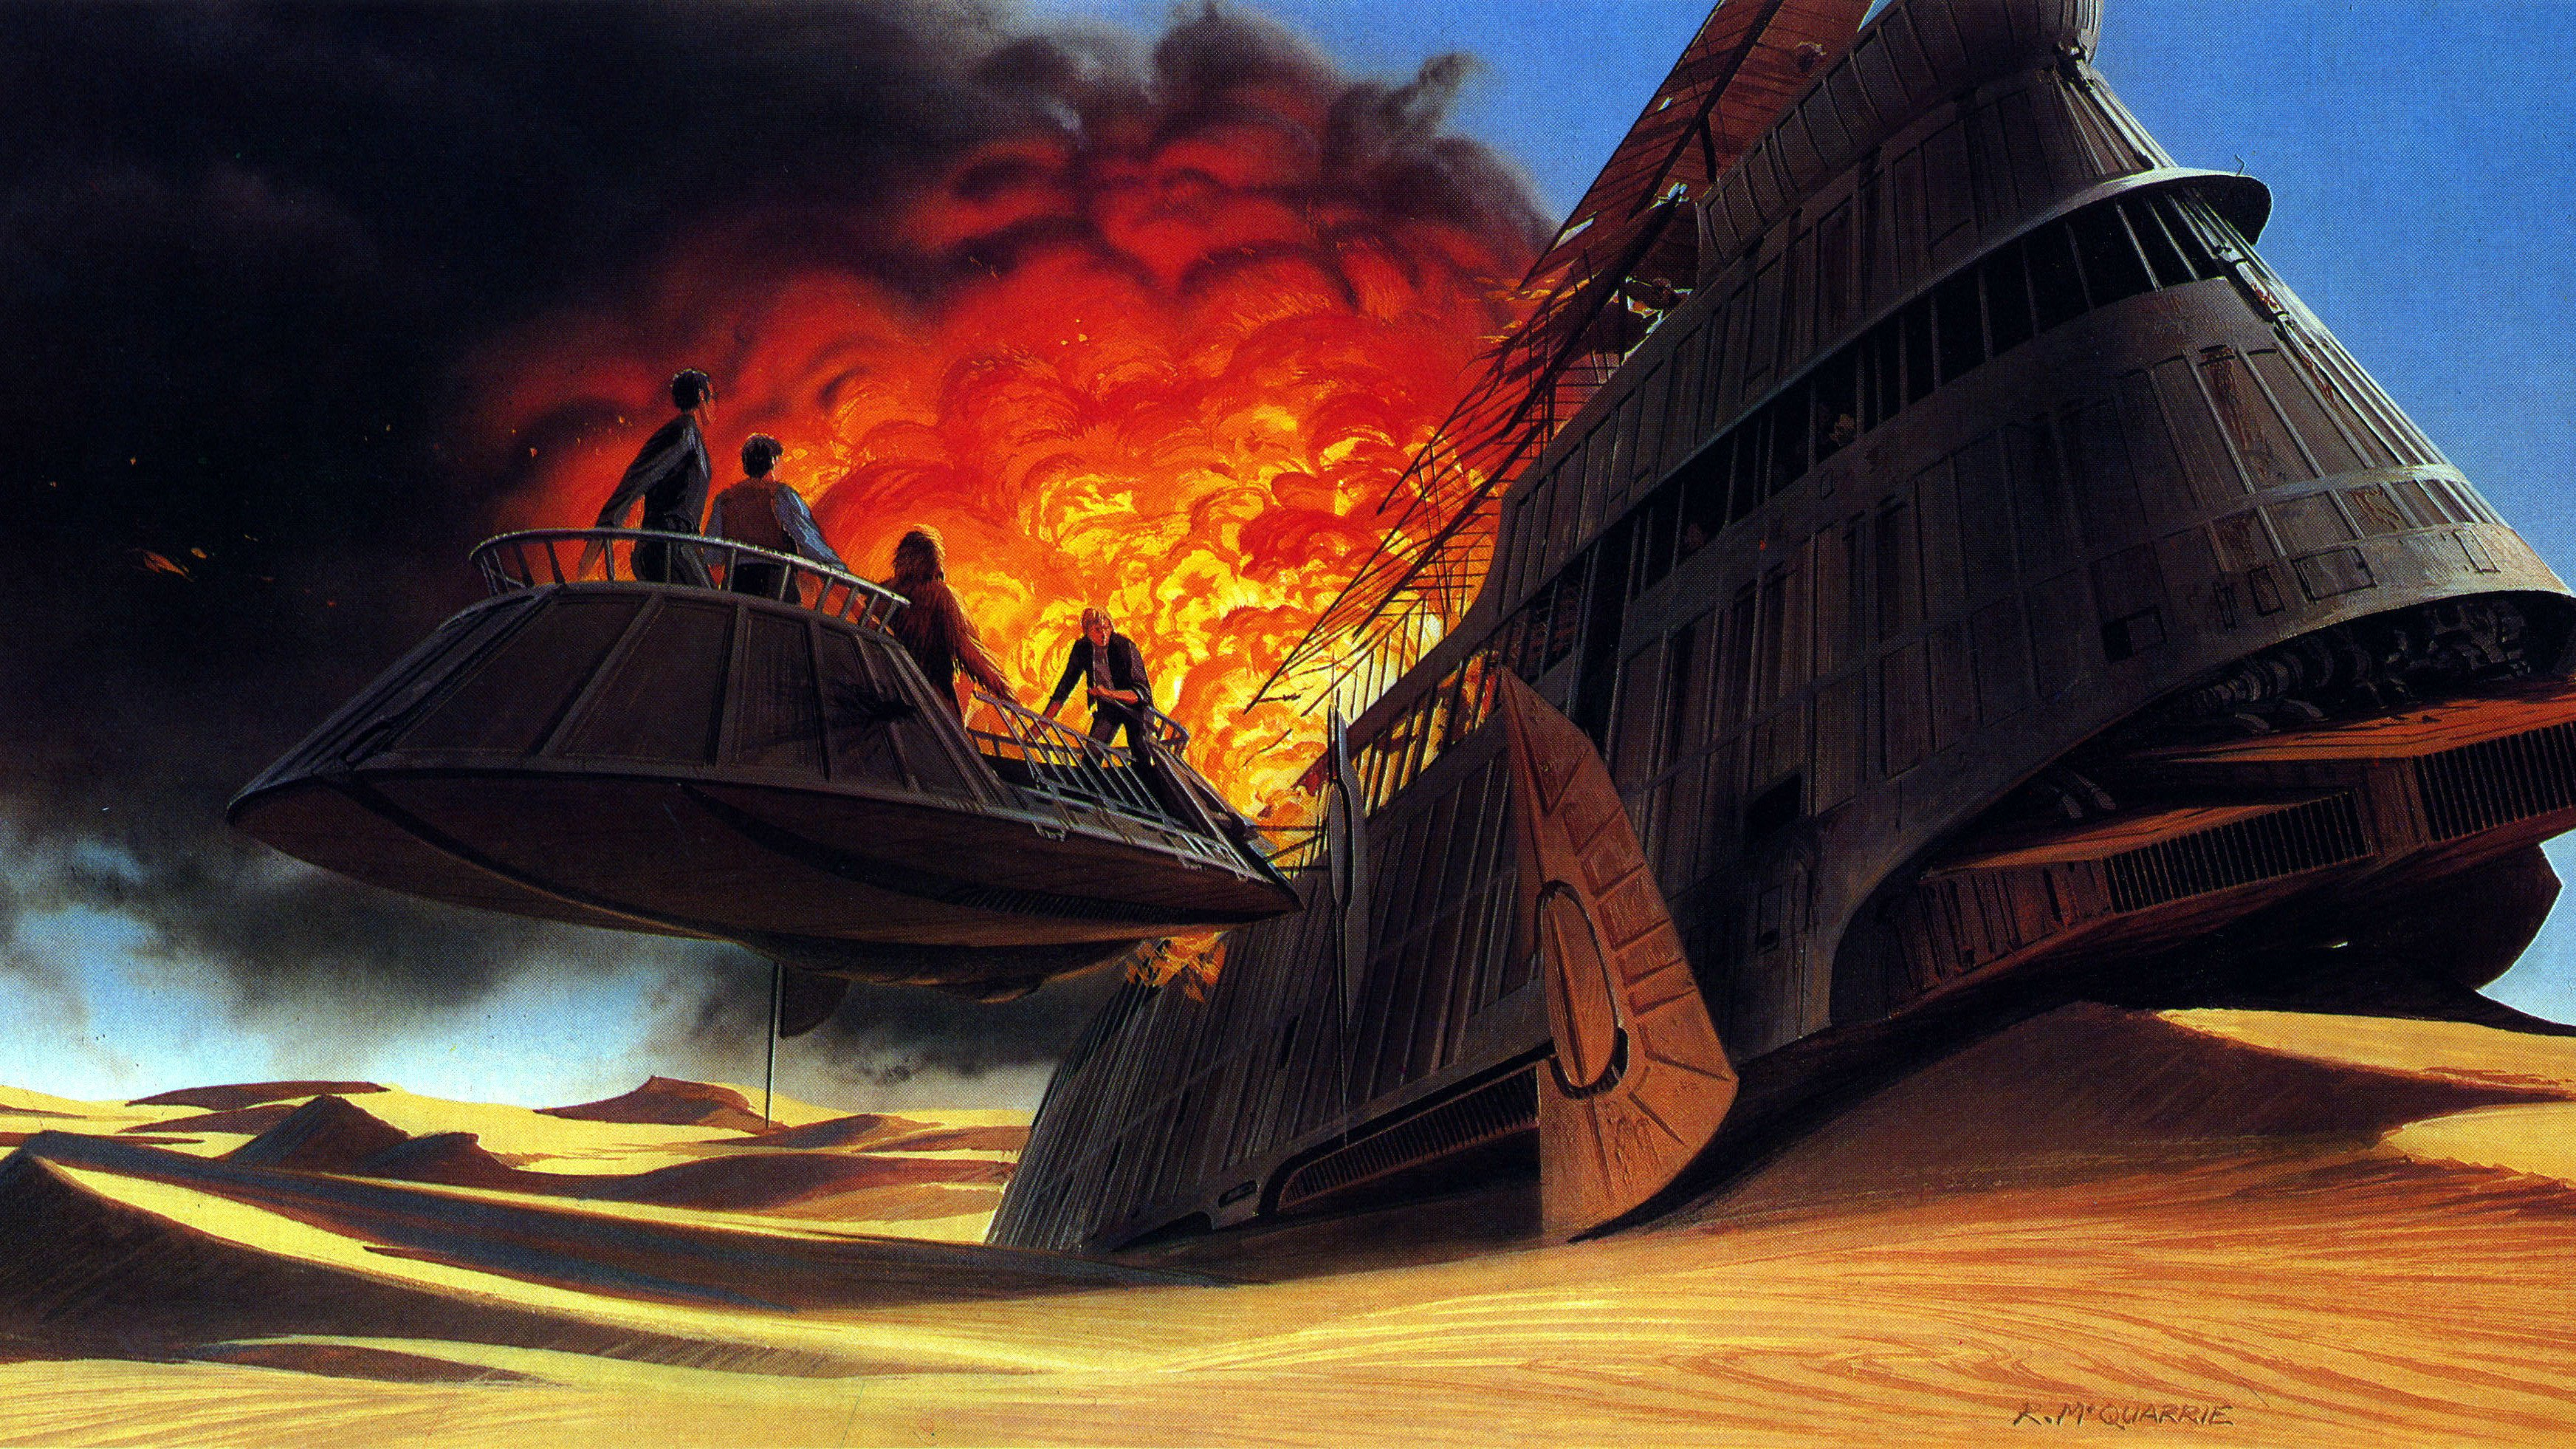 Star wars episode vi return of the jedi wallpapers - Jedi wallpaper ...